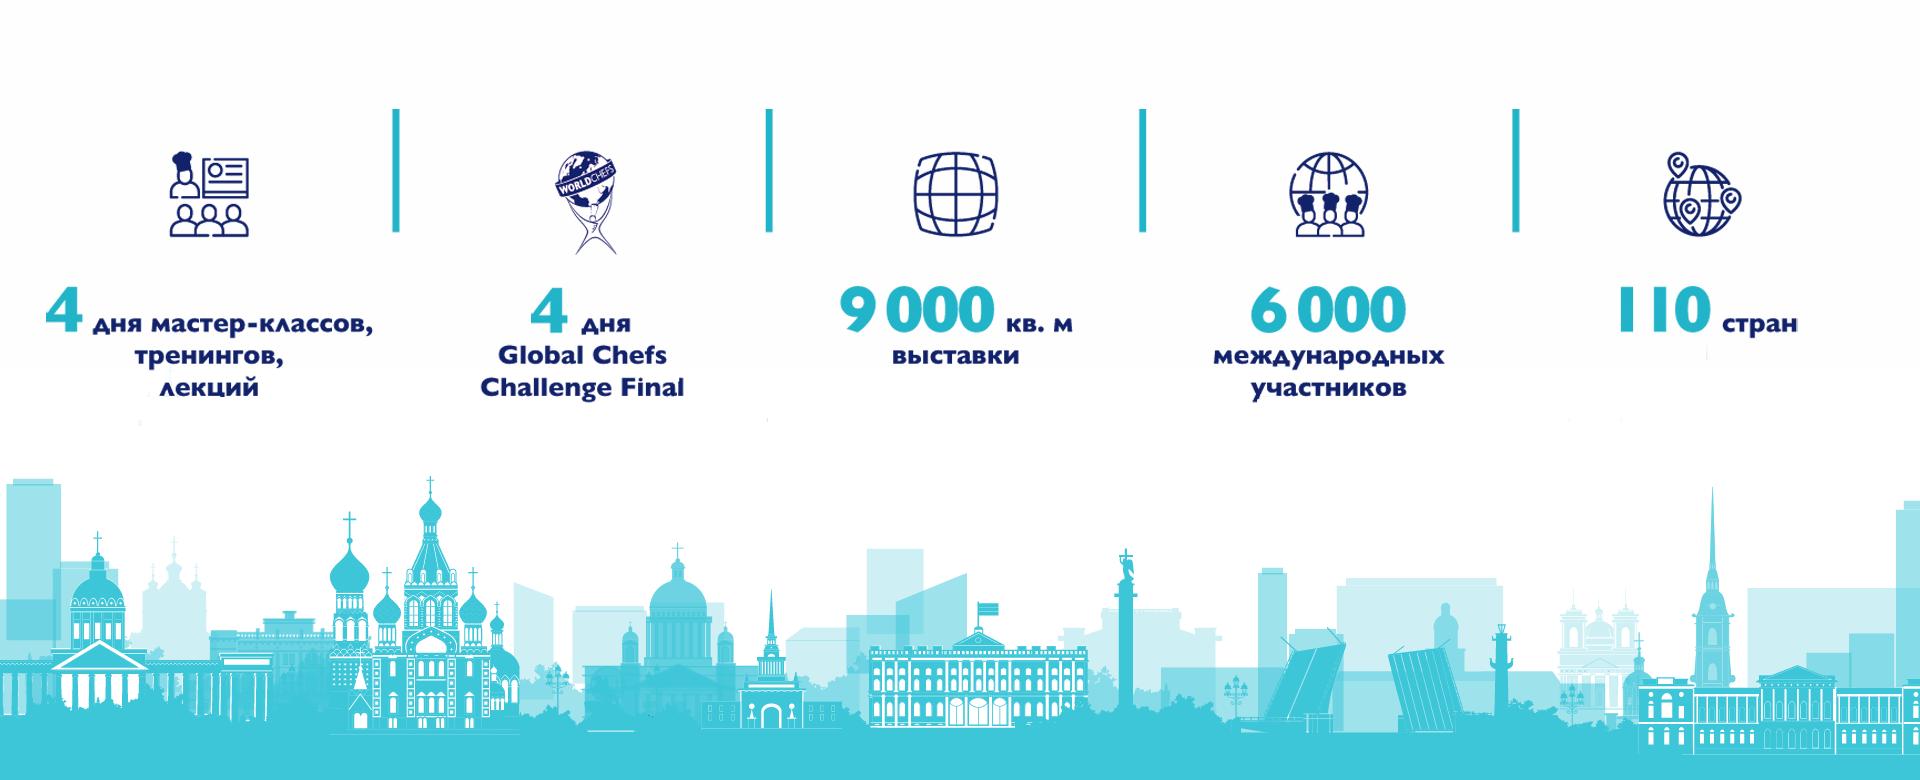 WorldChefs Congress&Expo 2020 в Санкт-Петербурге с 29 июля по 1 августа